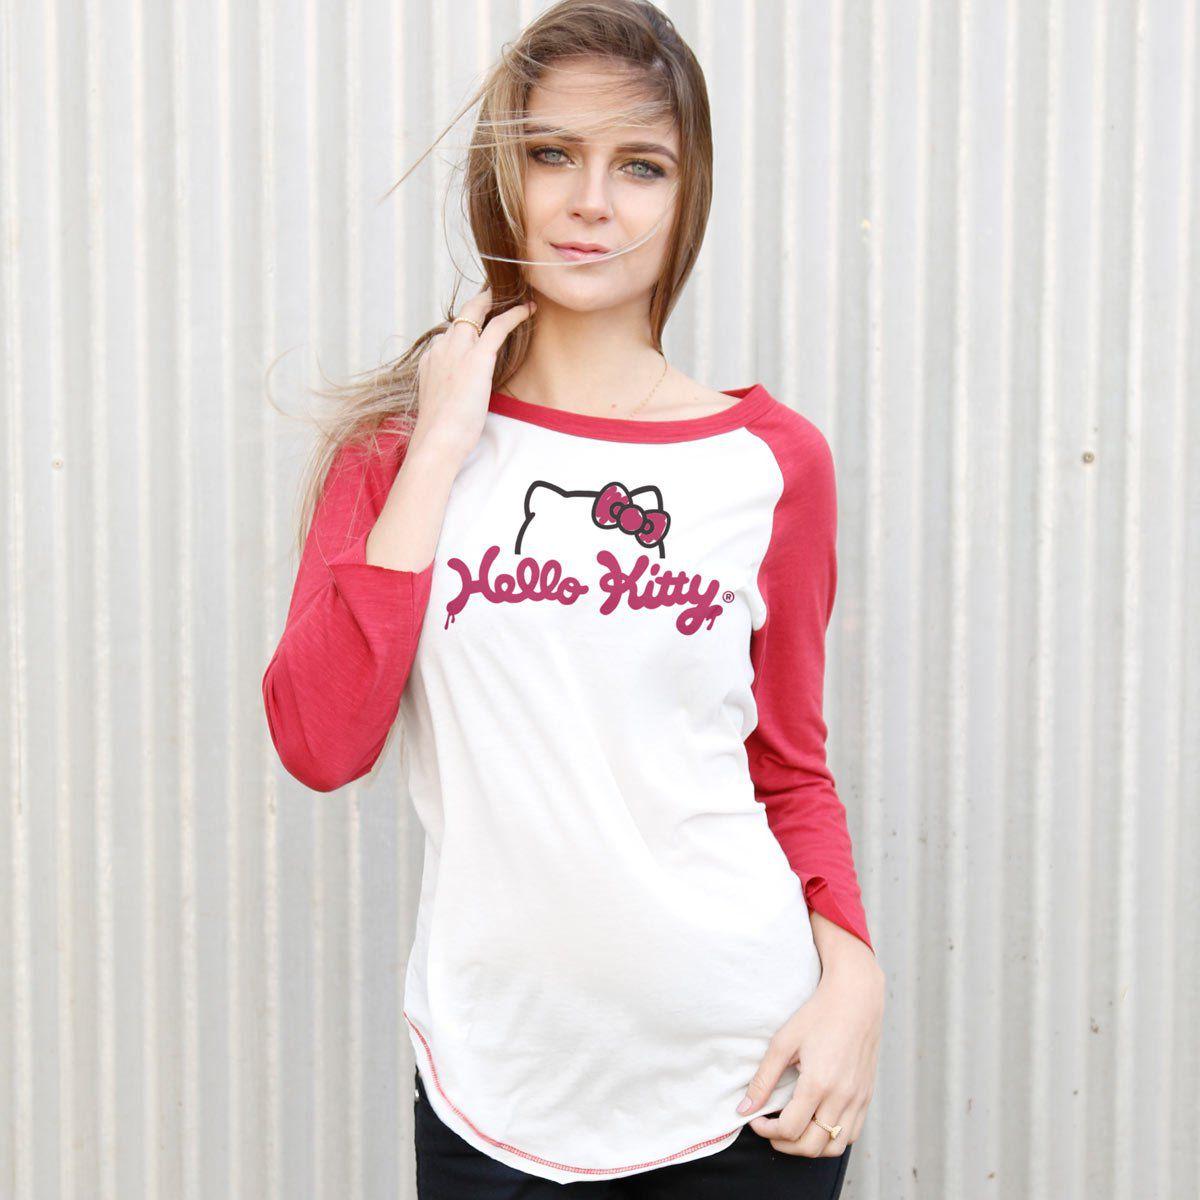 Camiseta Manga Longa Feminina Hello Kitty Charm  - bandUP Store Marketplace